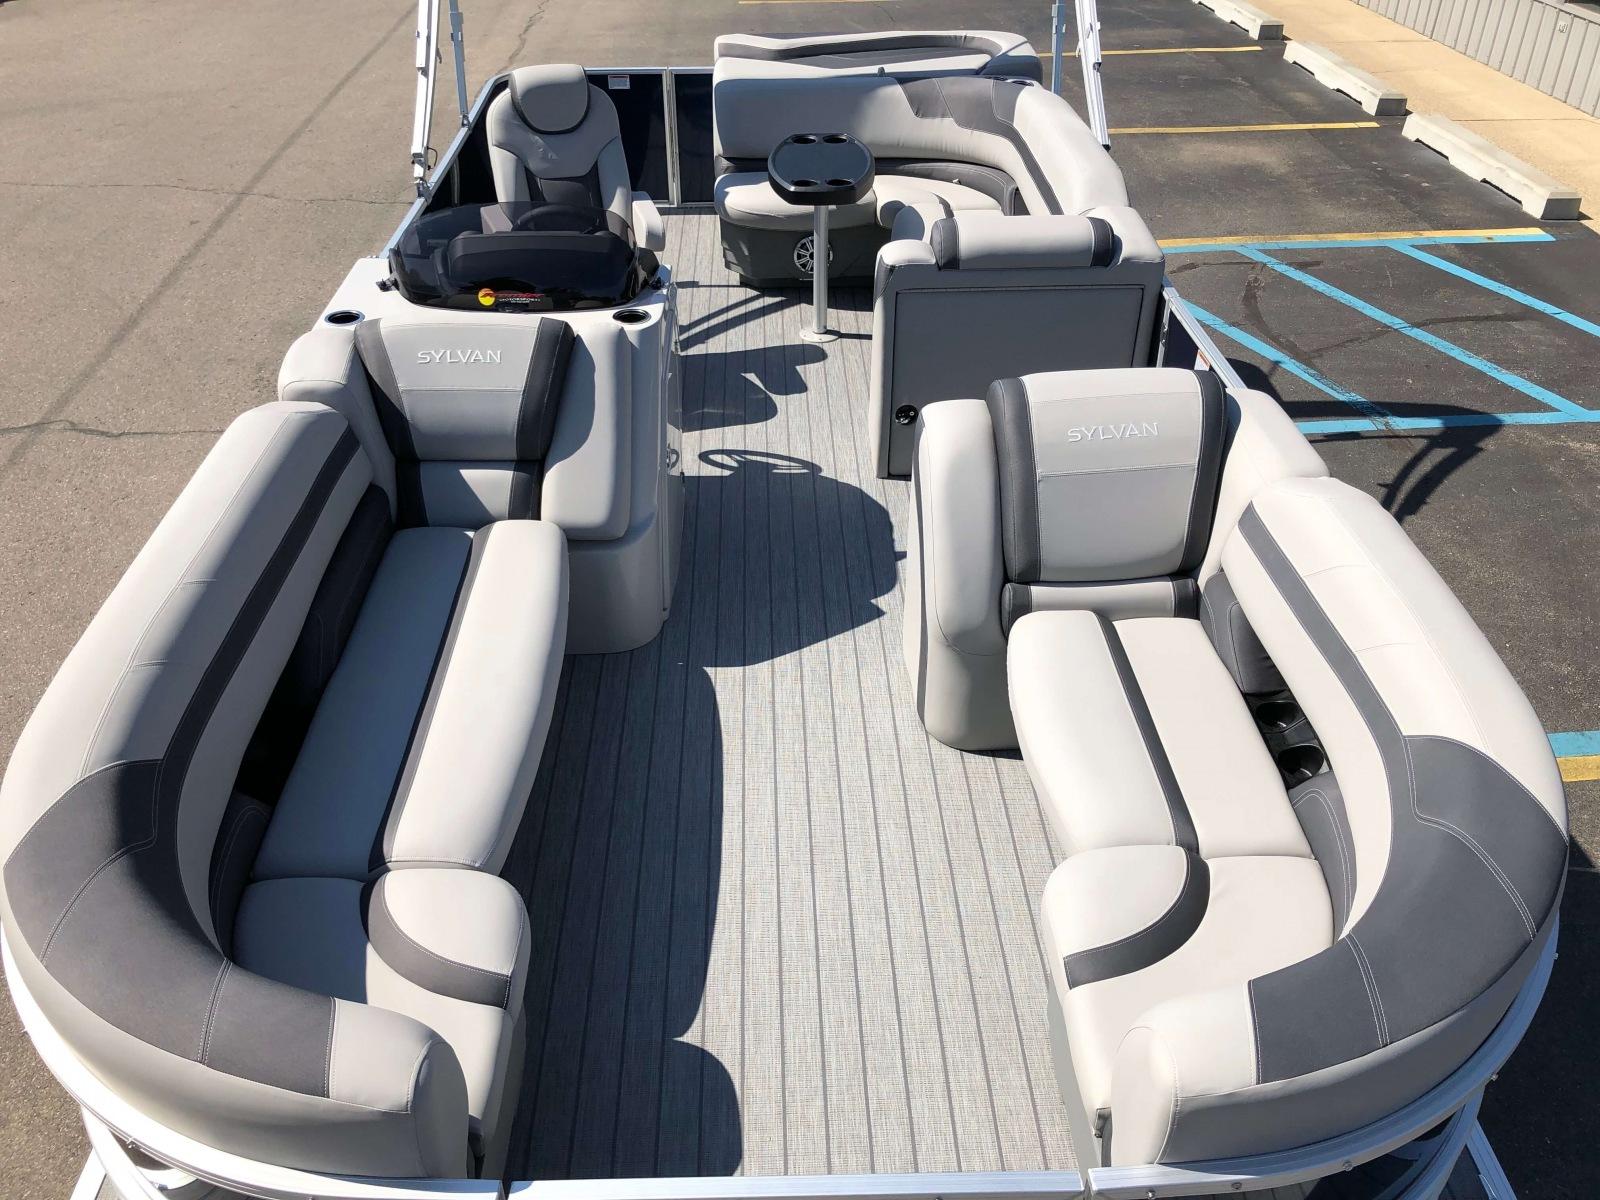 Gray Teak Weave Vinyl Flooring of a 2020 Sylvan L3 Cruise Pontoon